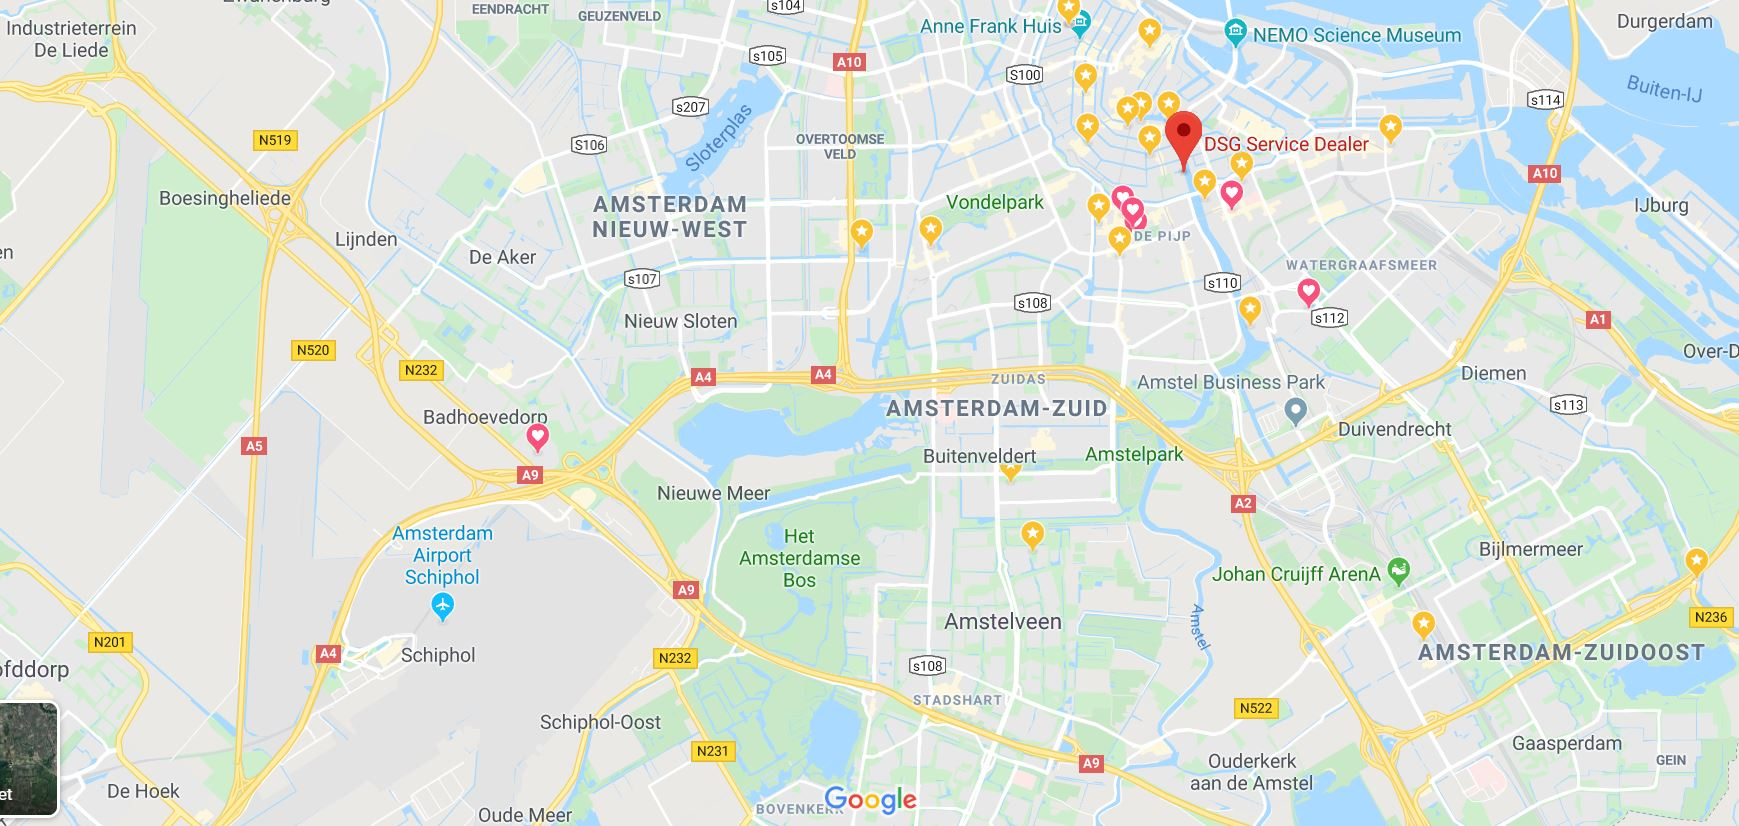 google maps DSG Service dealers Amsterdam Maarten Jansz Kosterstraat 26 - Amsterdam DSG Service Dealer